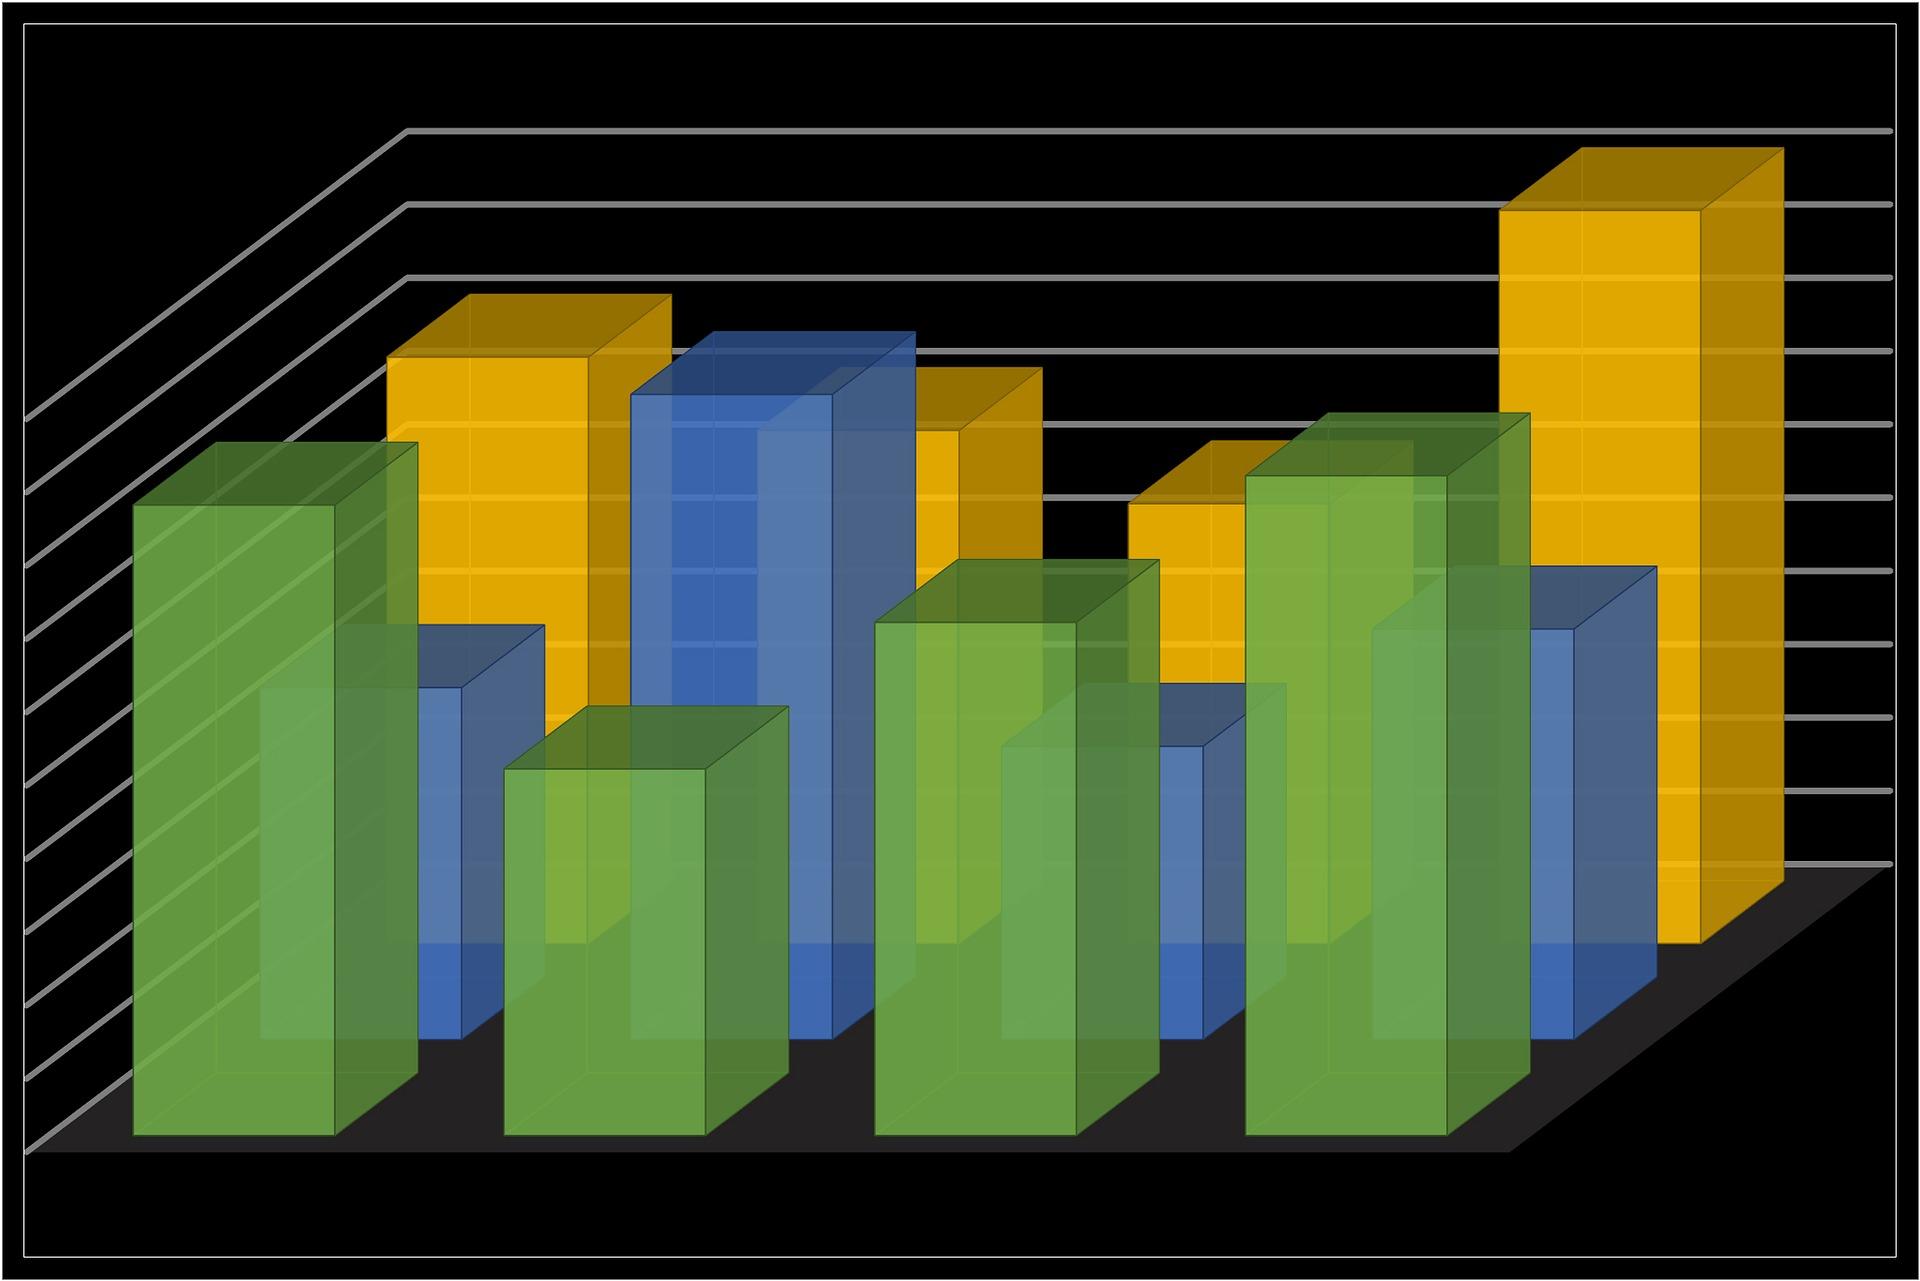 Mines' contribution to Tanzania's economy